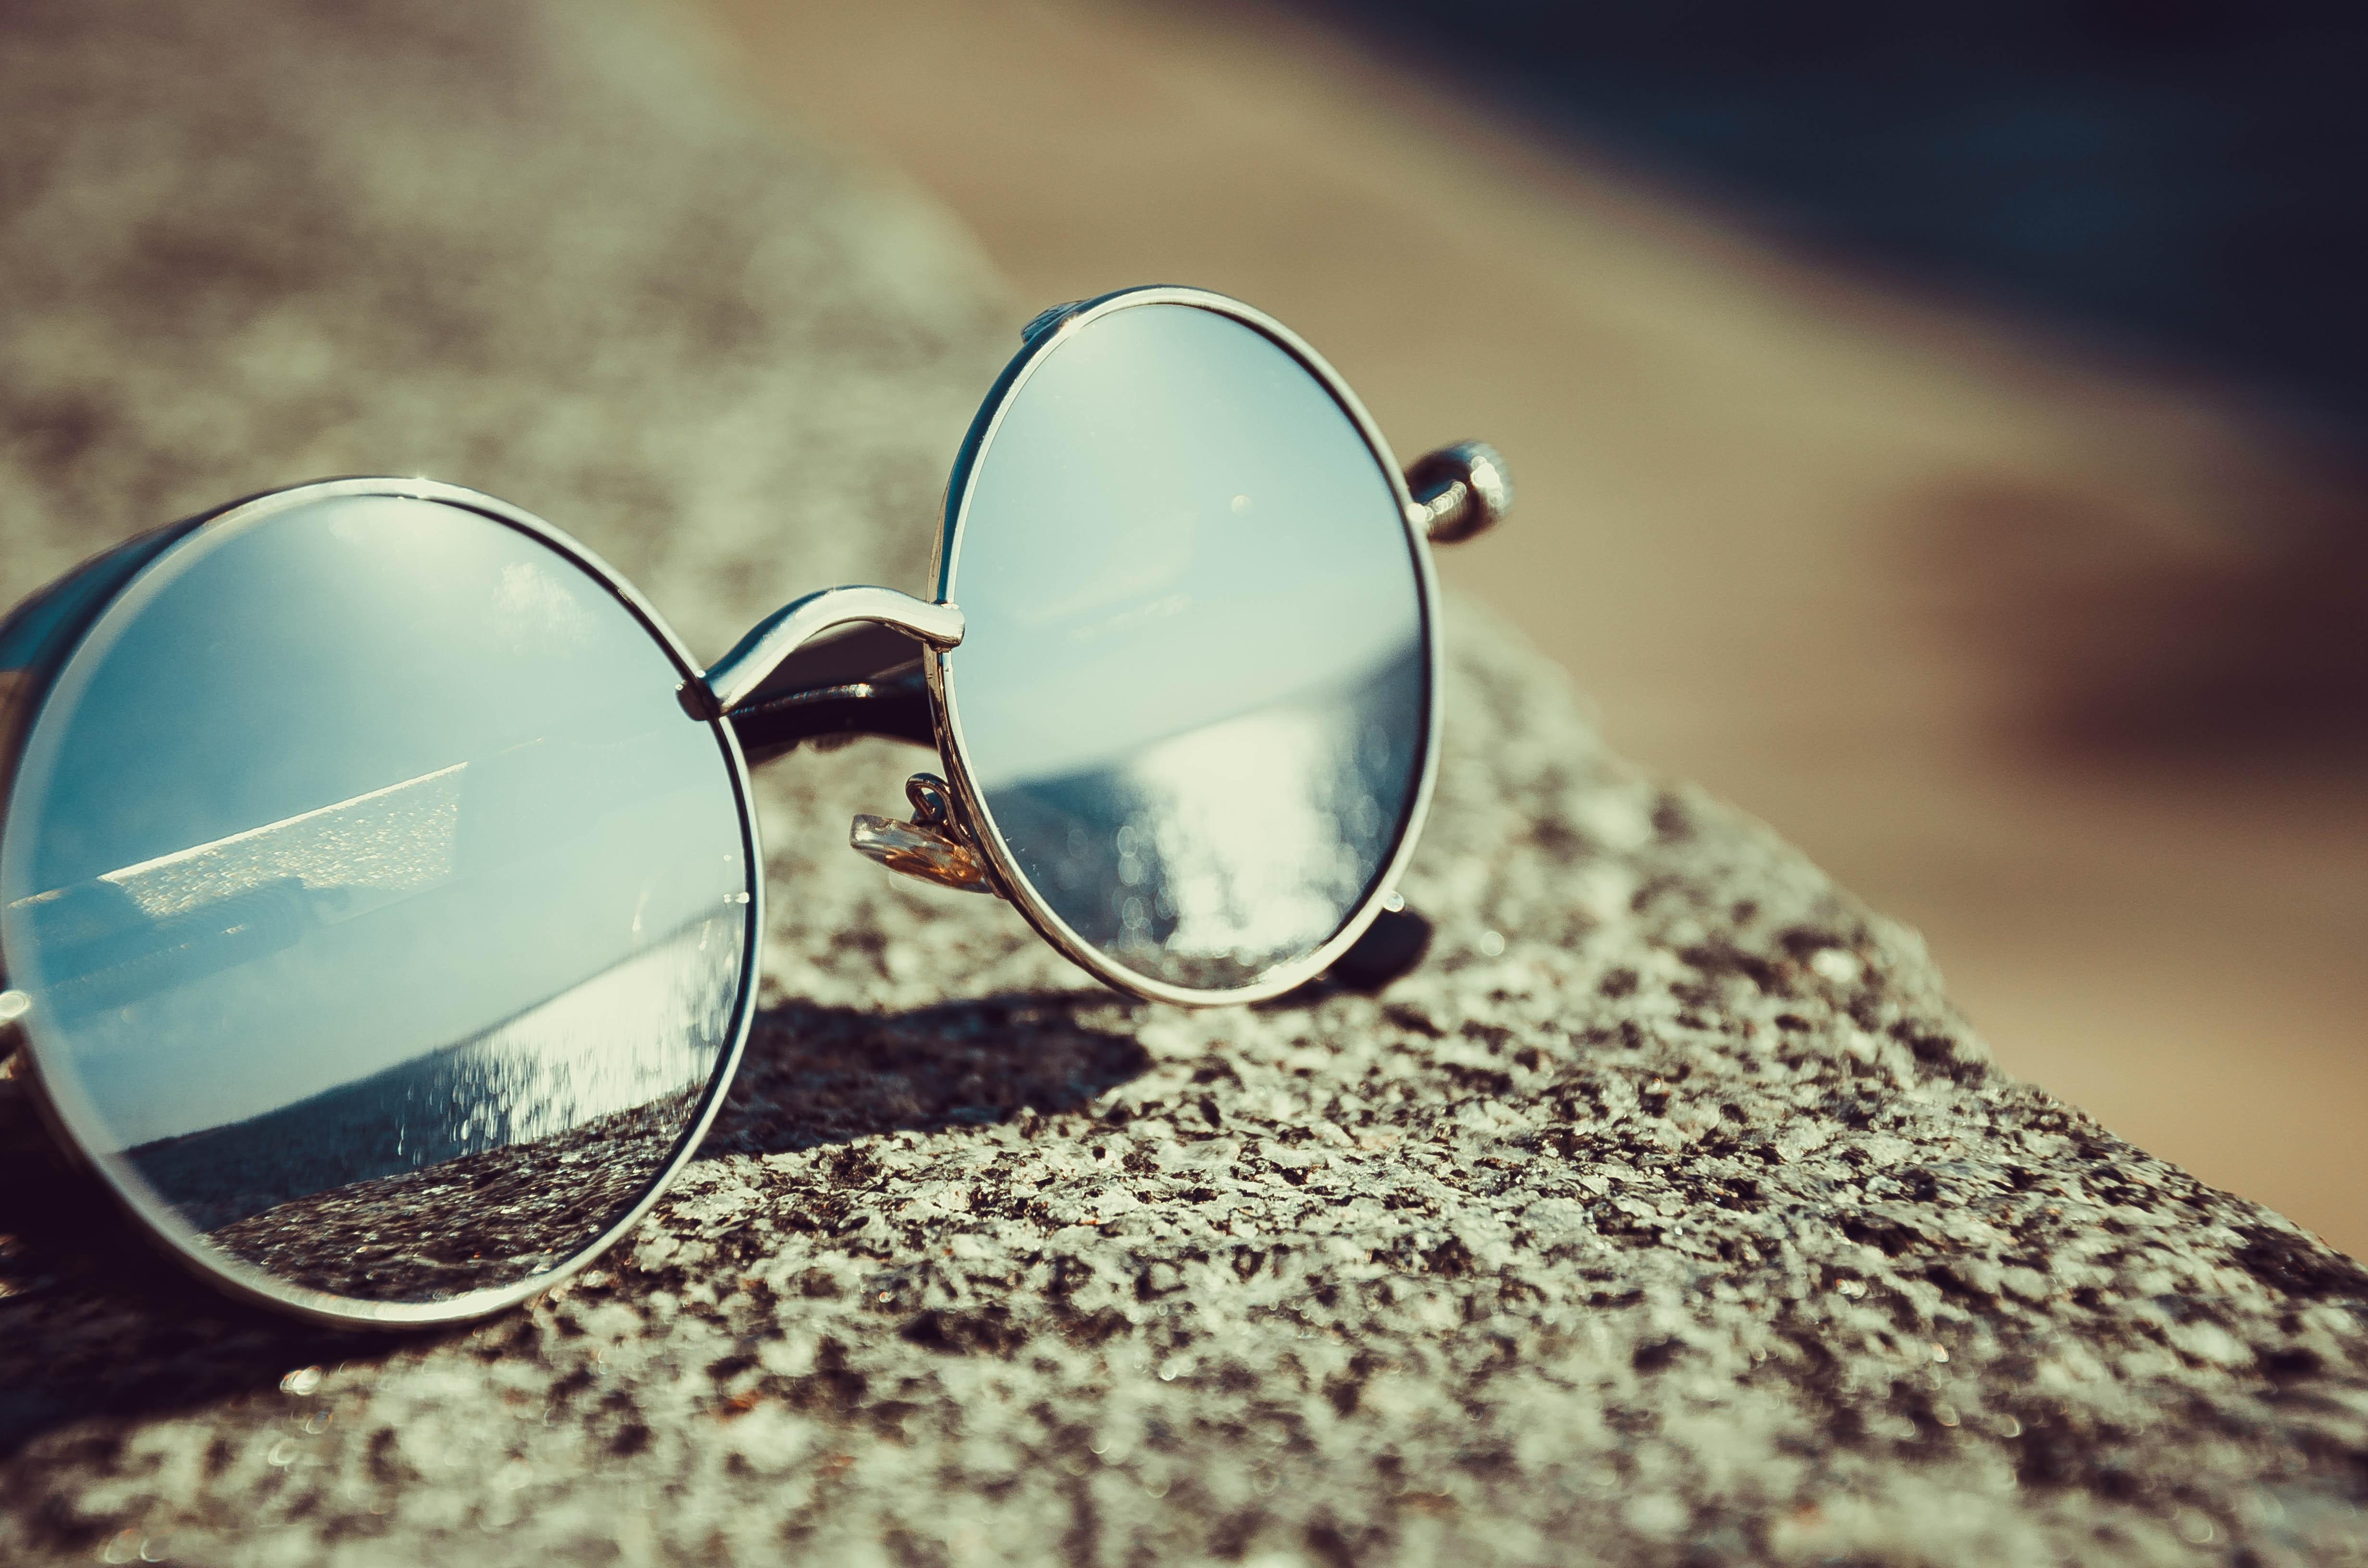 500+ Beautiful Eyeglasses Photos · Pexels · Free Stock Photos